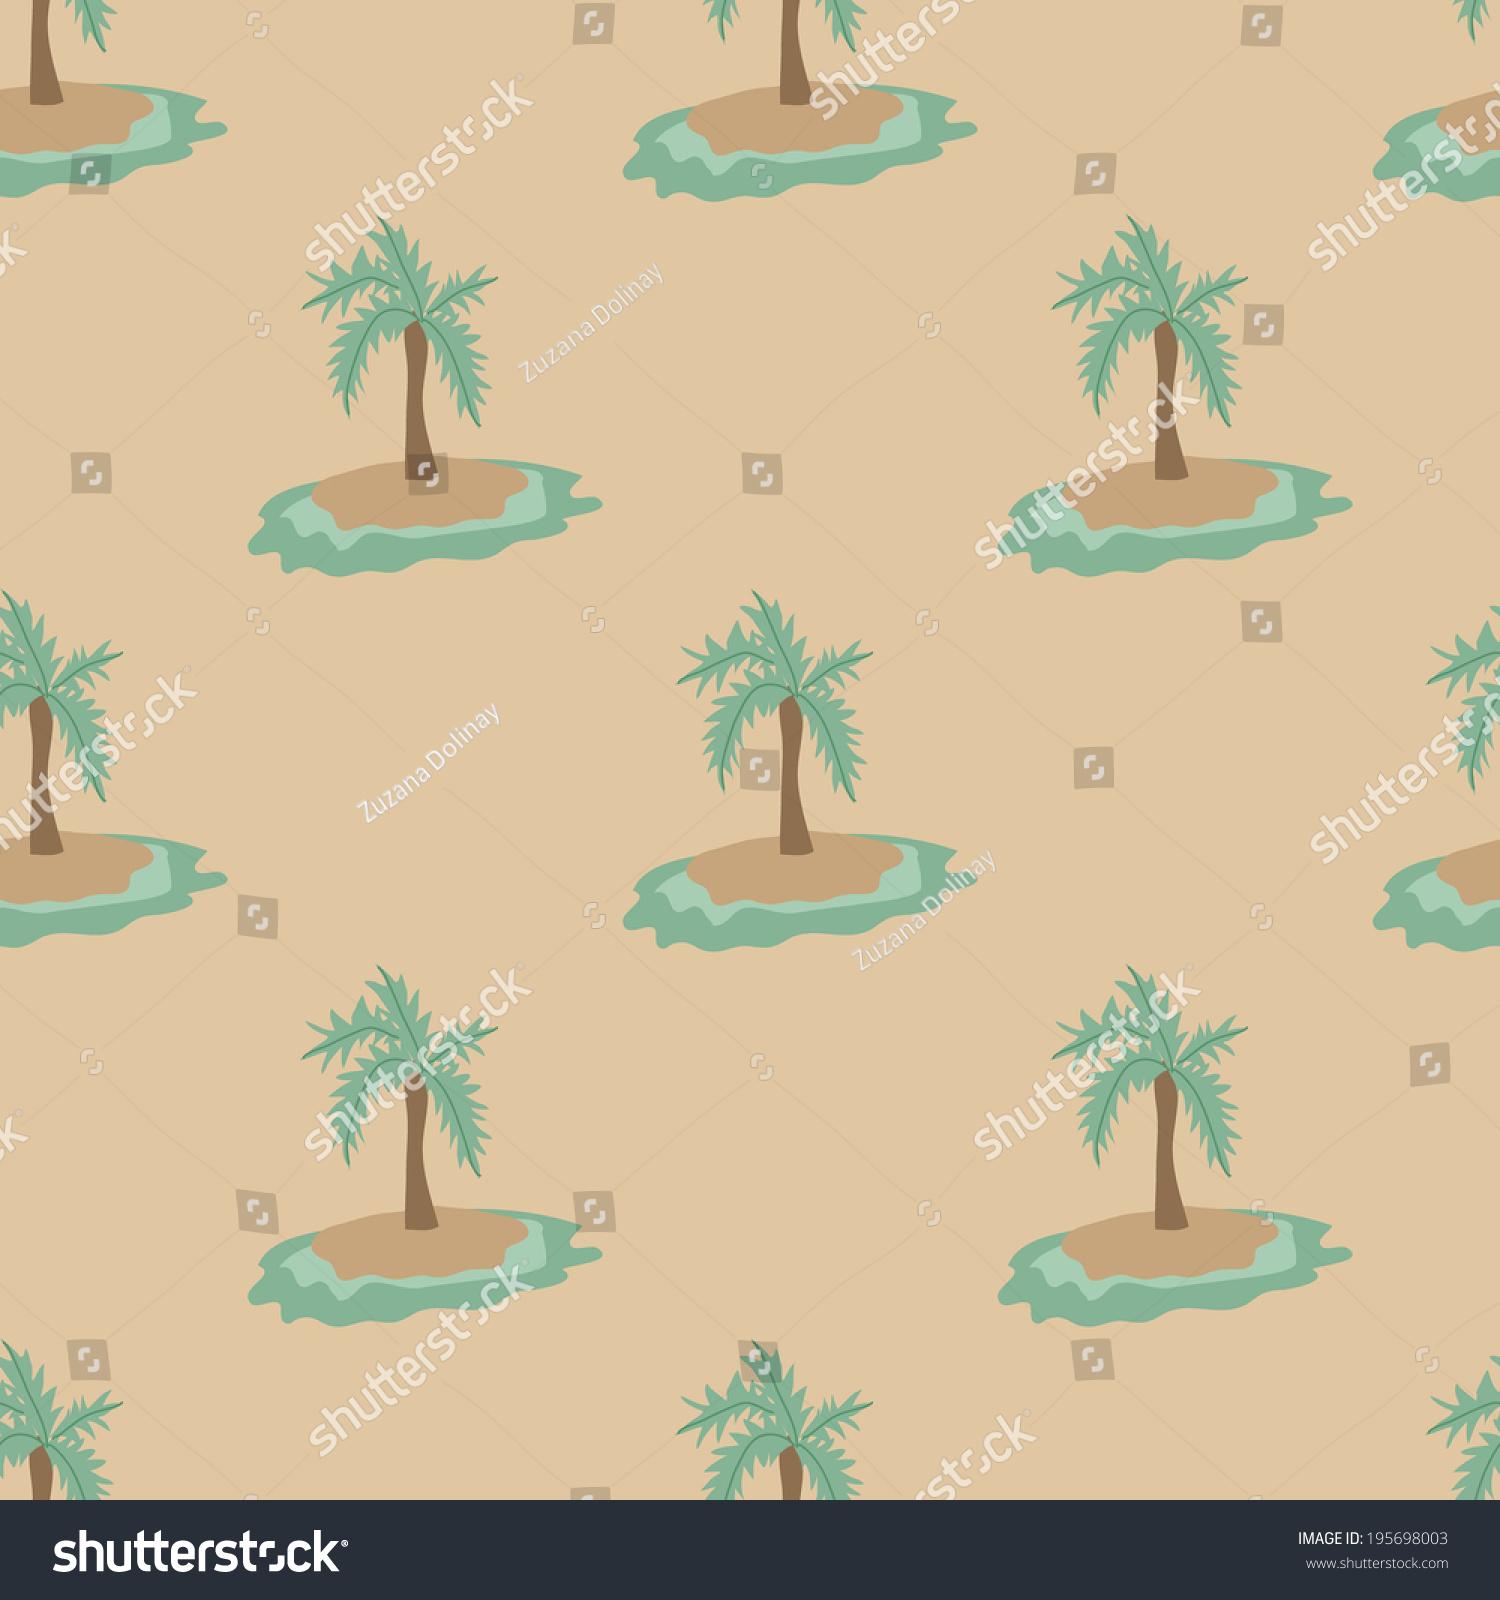 Kawaii Island Go Vacation: Cute Island Pattern Stock Vector 195698003